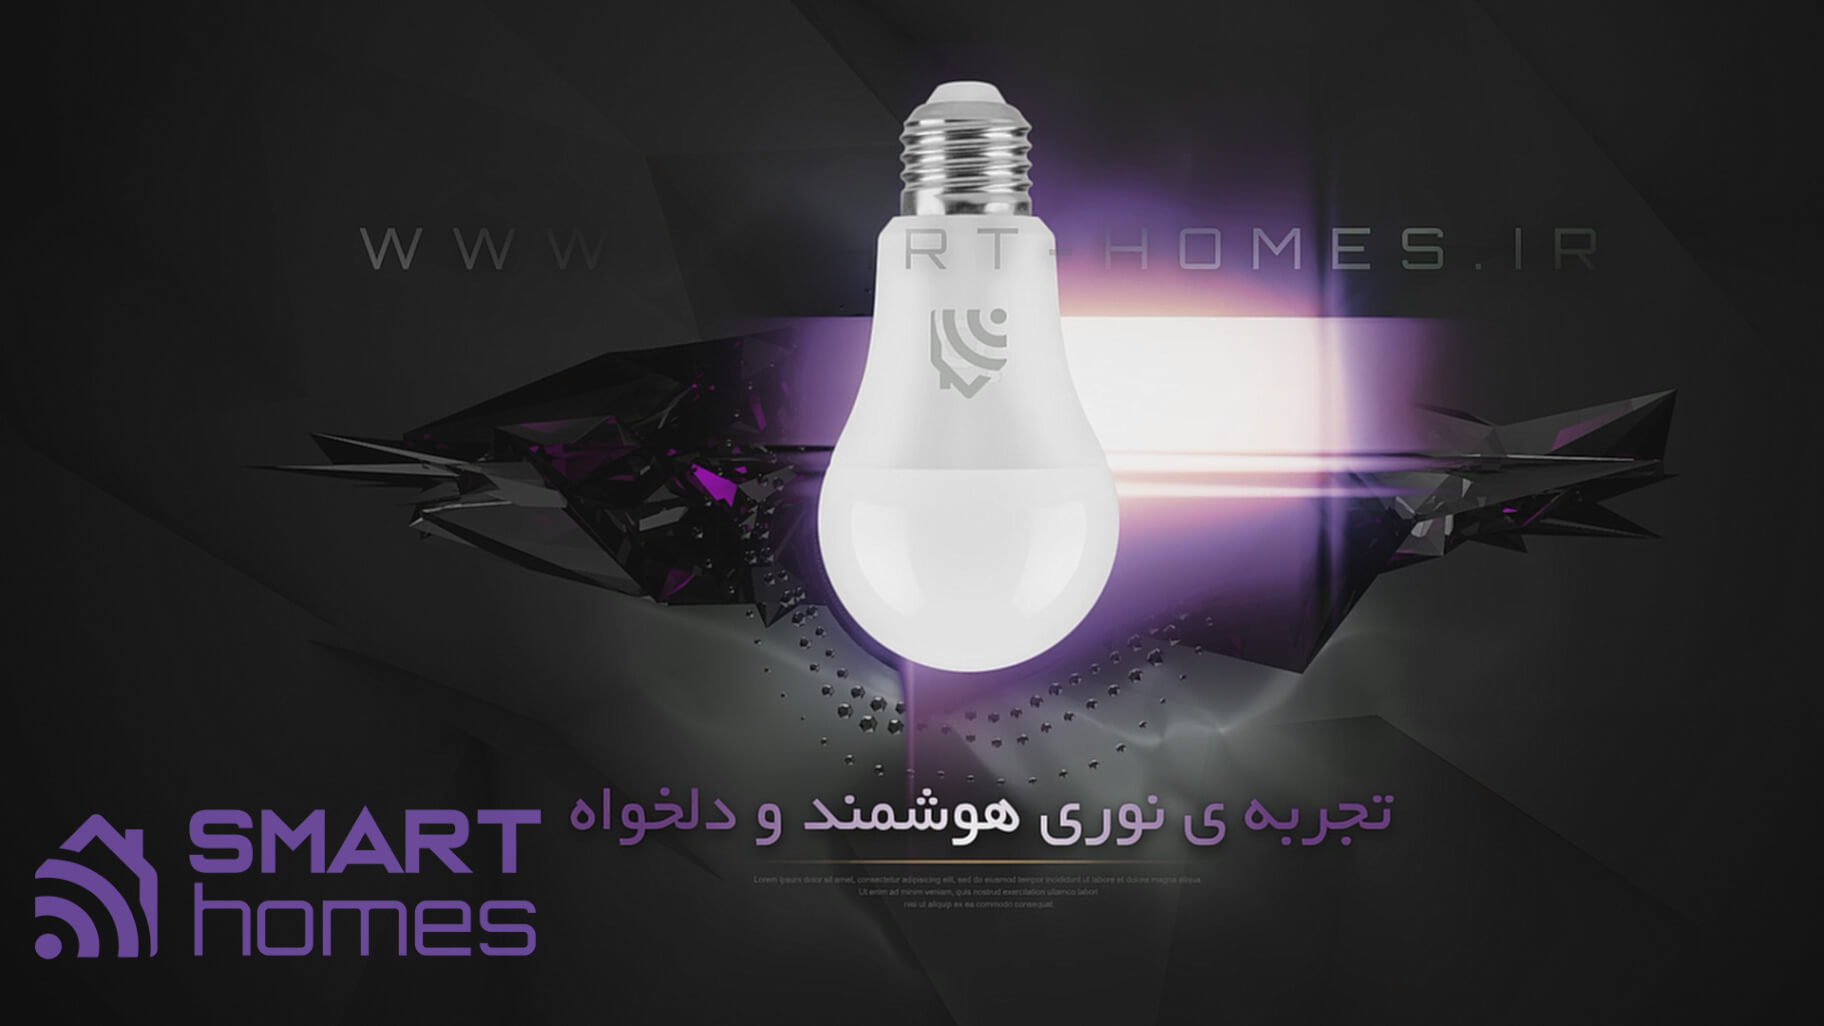 نور و روشنایی هوشمند